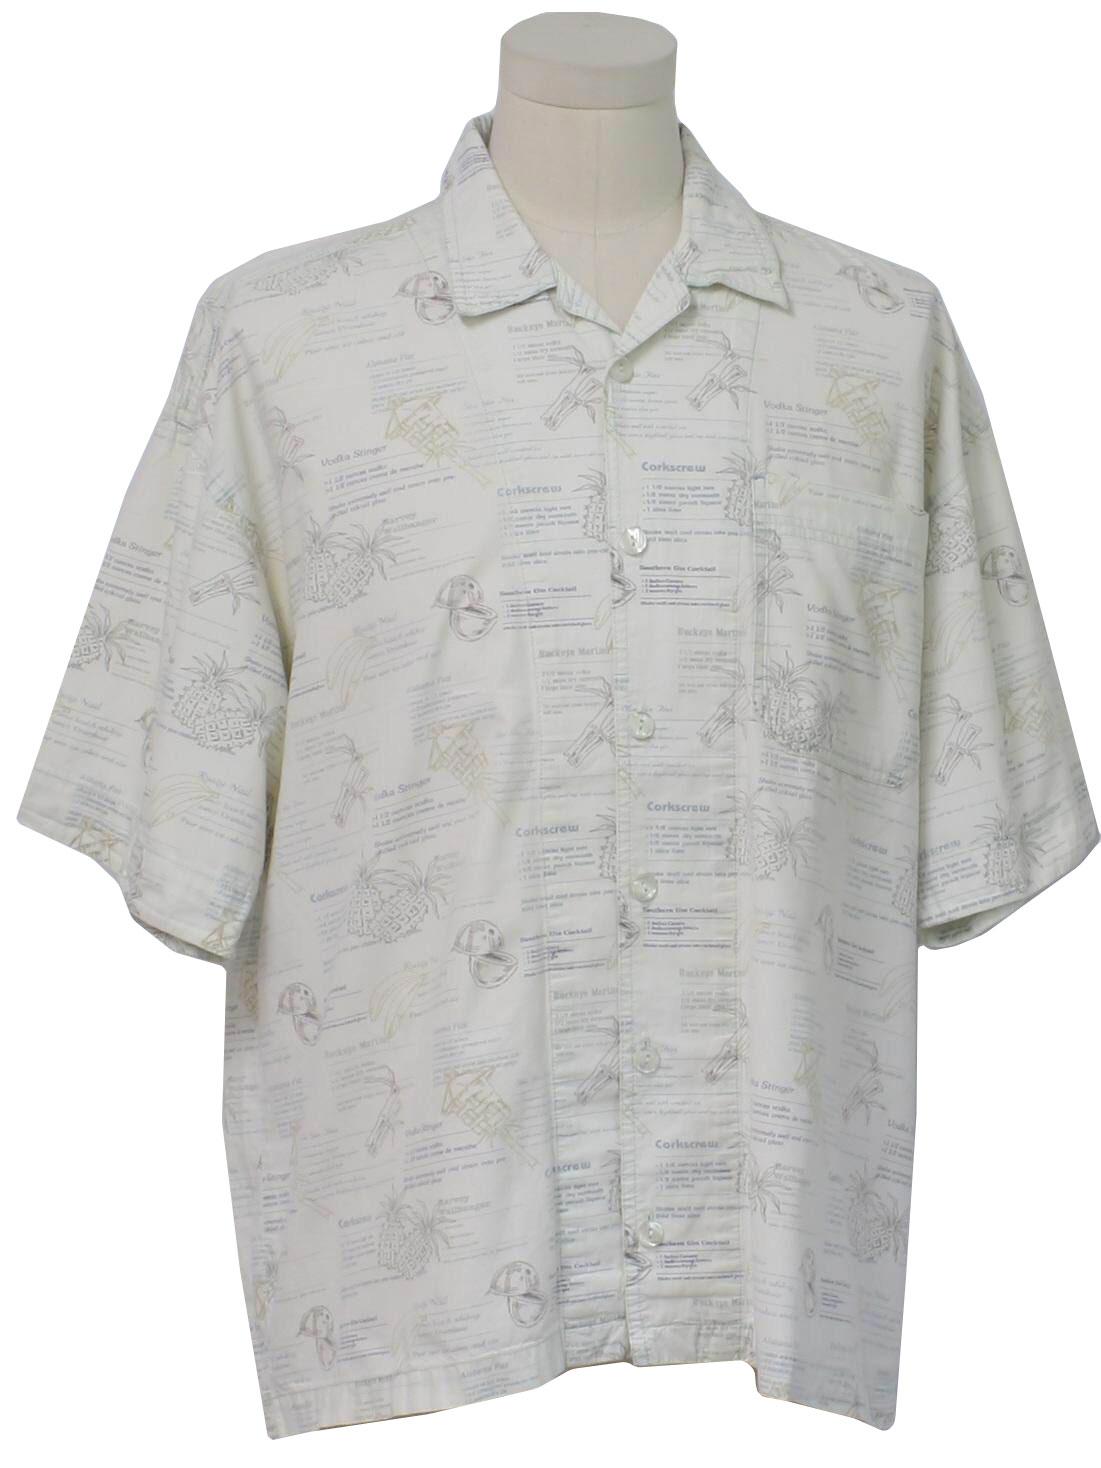 8d61b85b 1980's Coupe de Ville by QuikSilver Mens Hawaiian Shirt $25.00 In stock.  Item No. 256053-A16485